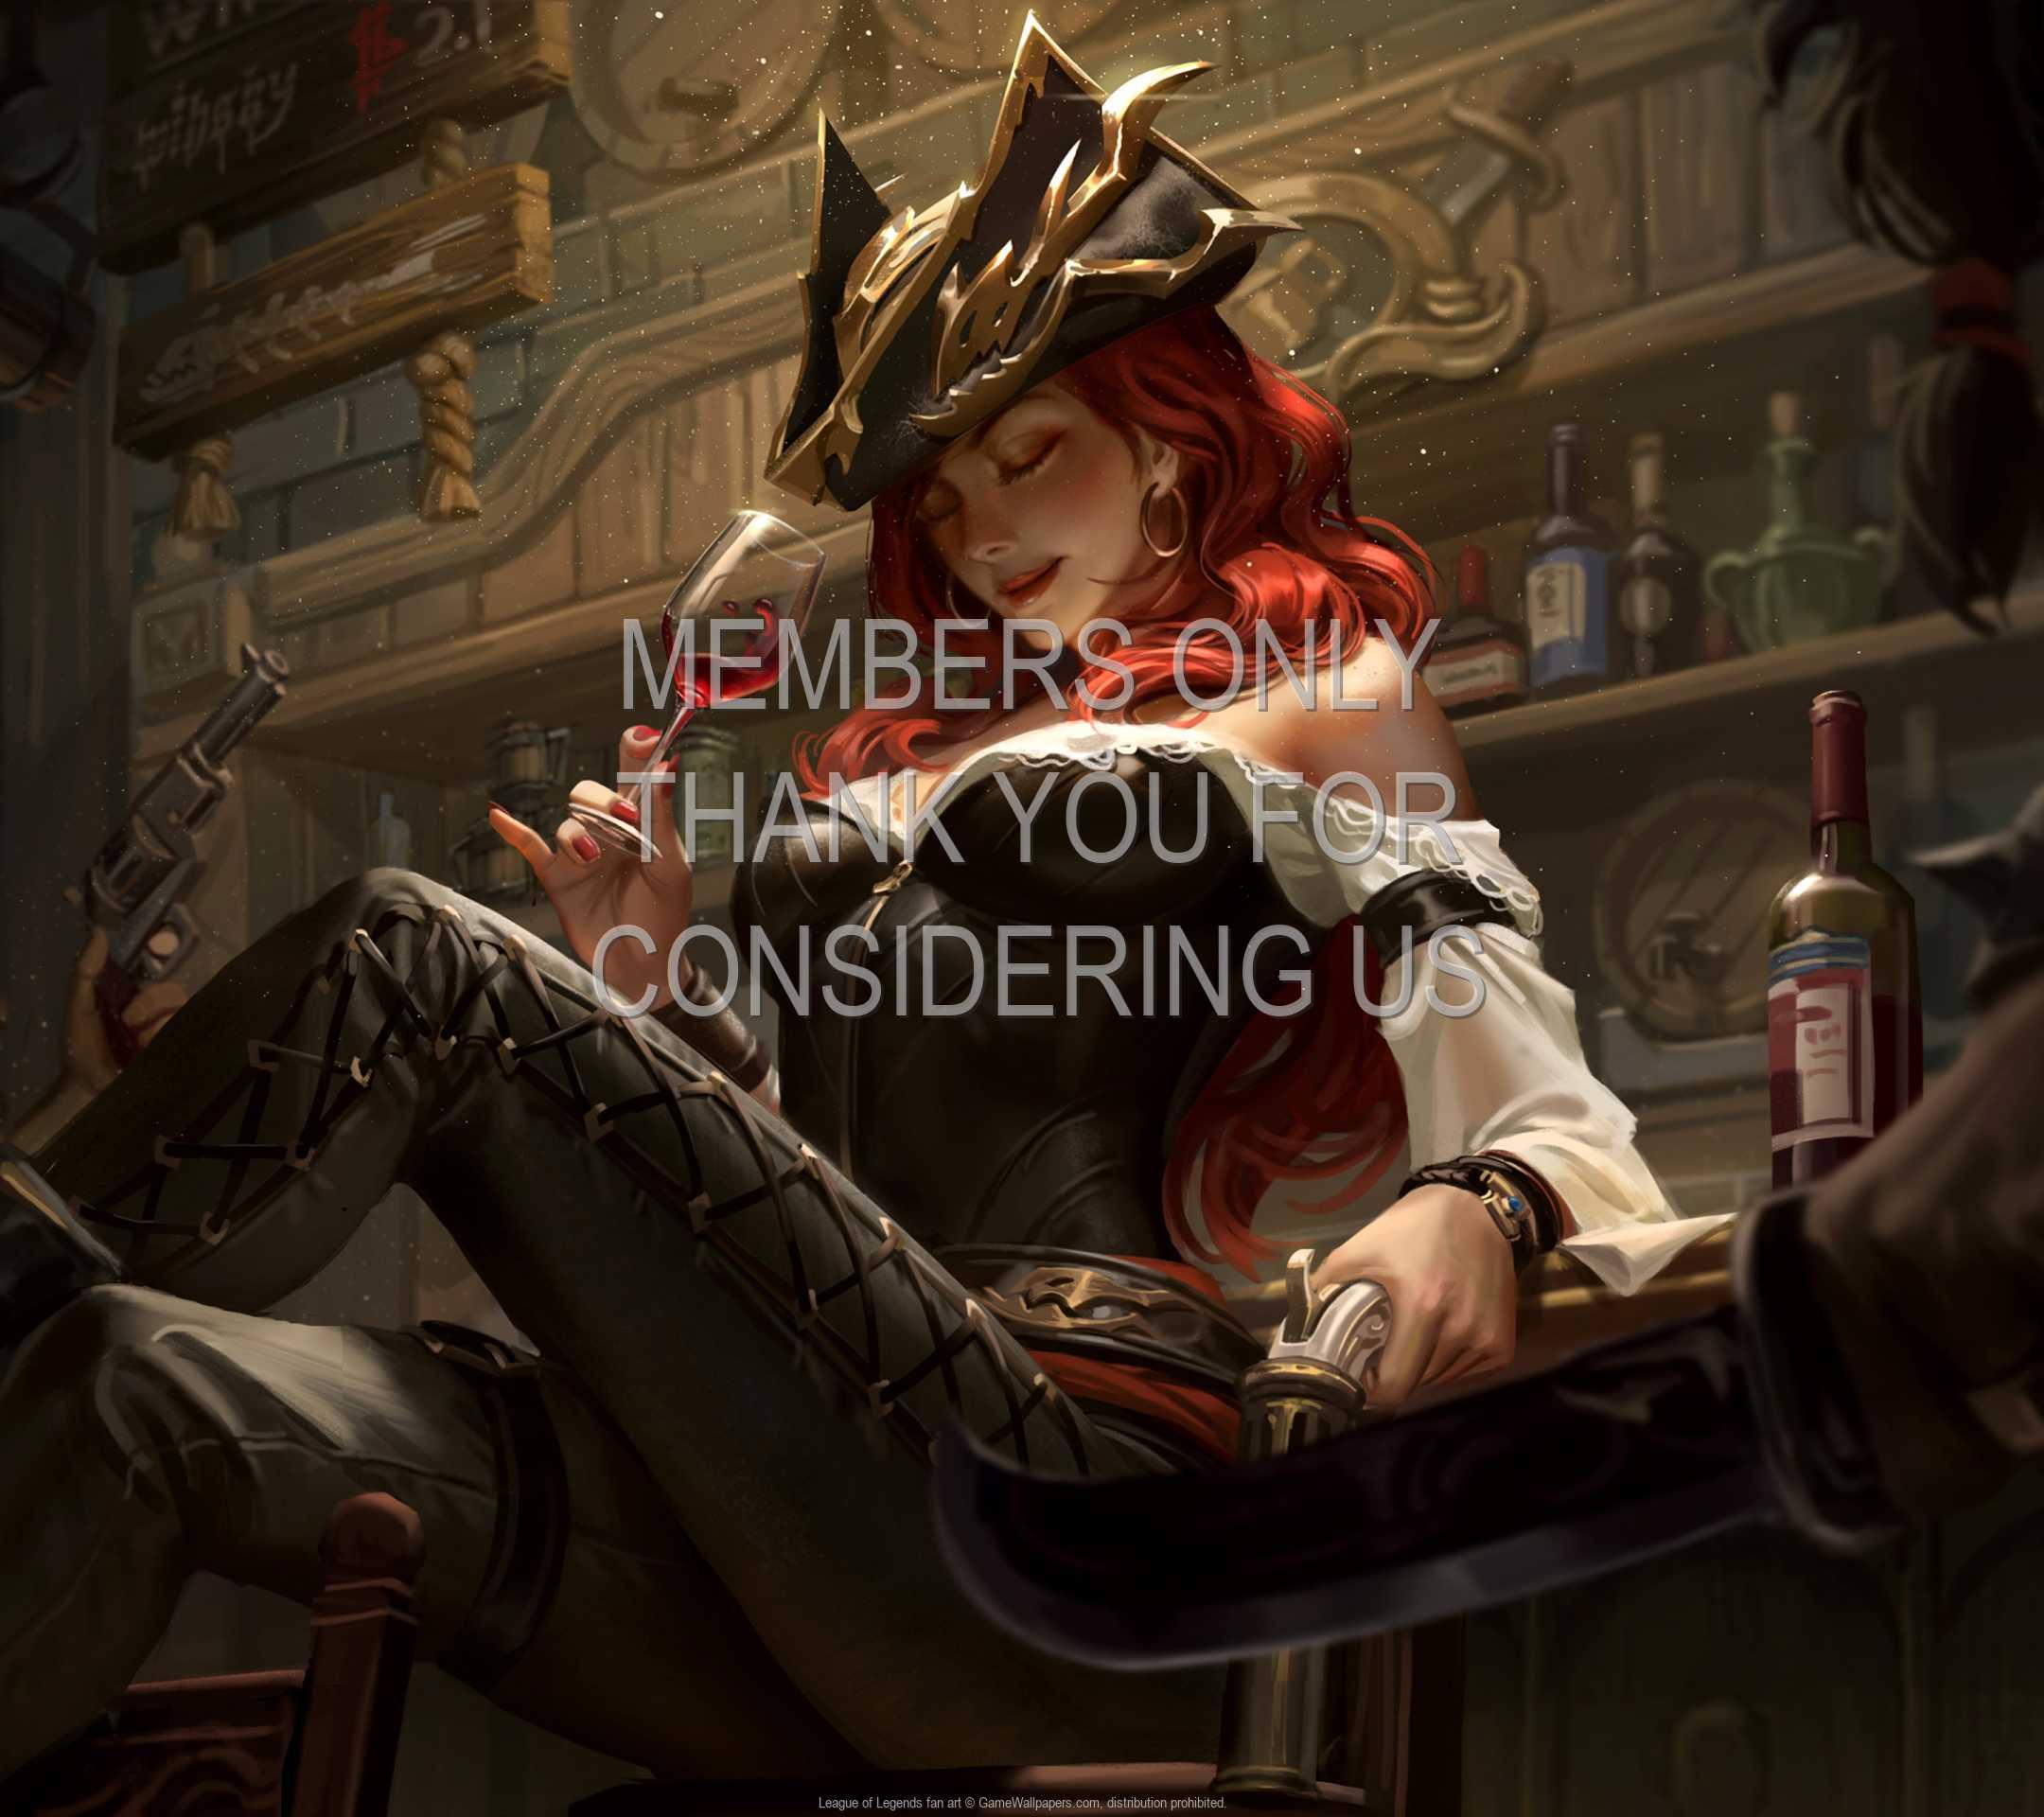 League of Legends fan art 1080p Horizontal Mobile wallpaper or background 09